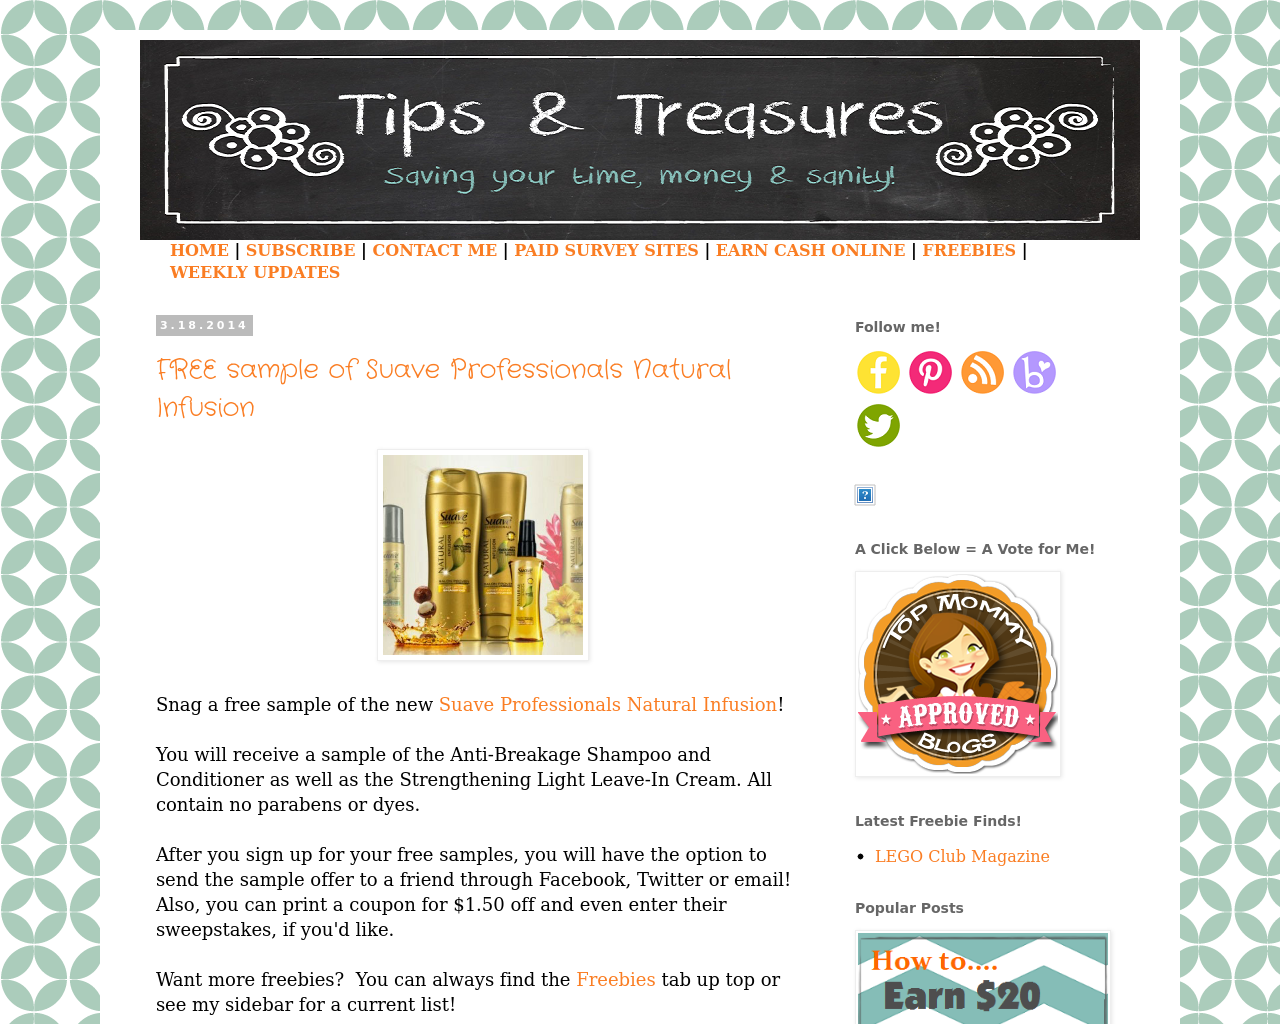 Tips-&-Treasures-Advertising-Reviews-Pricing